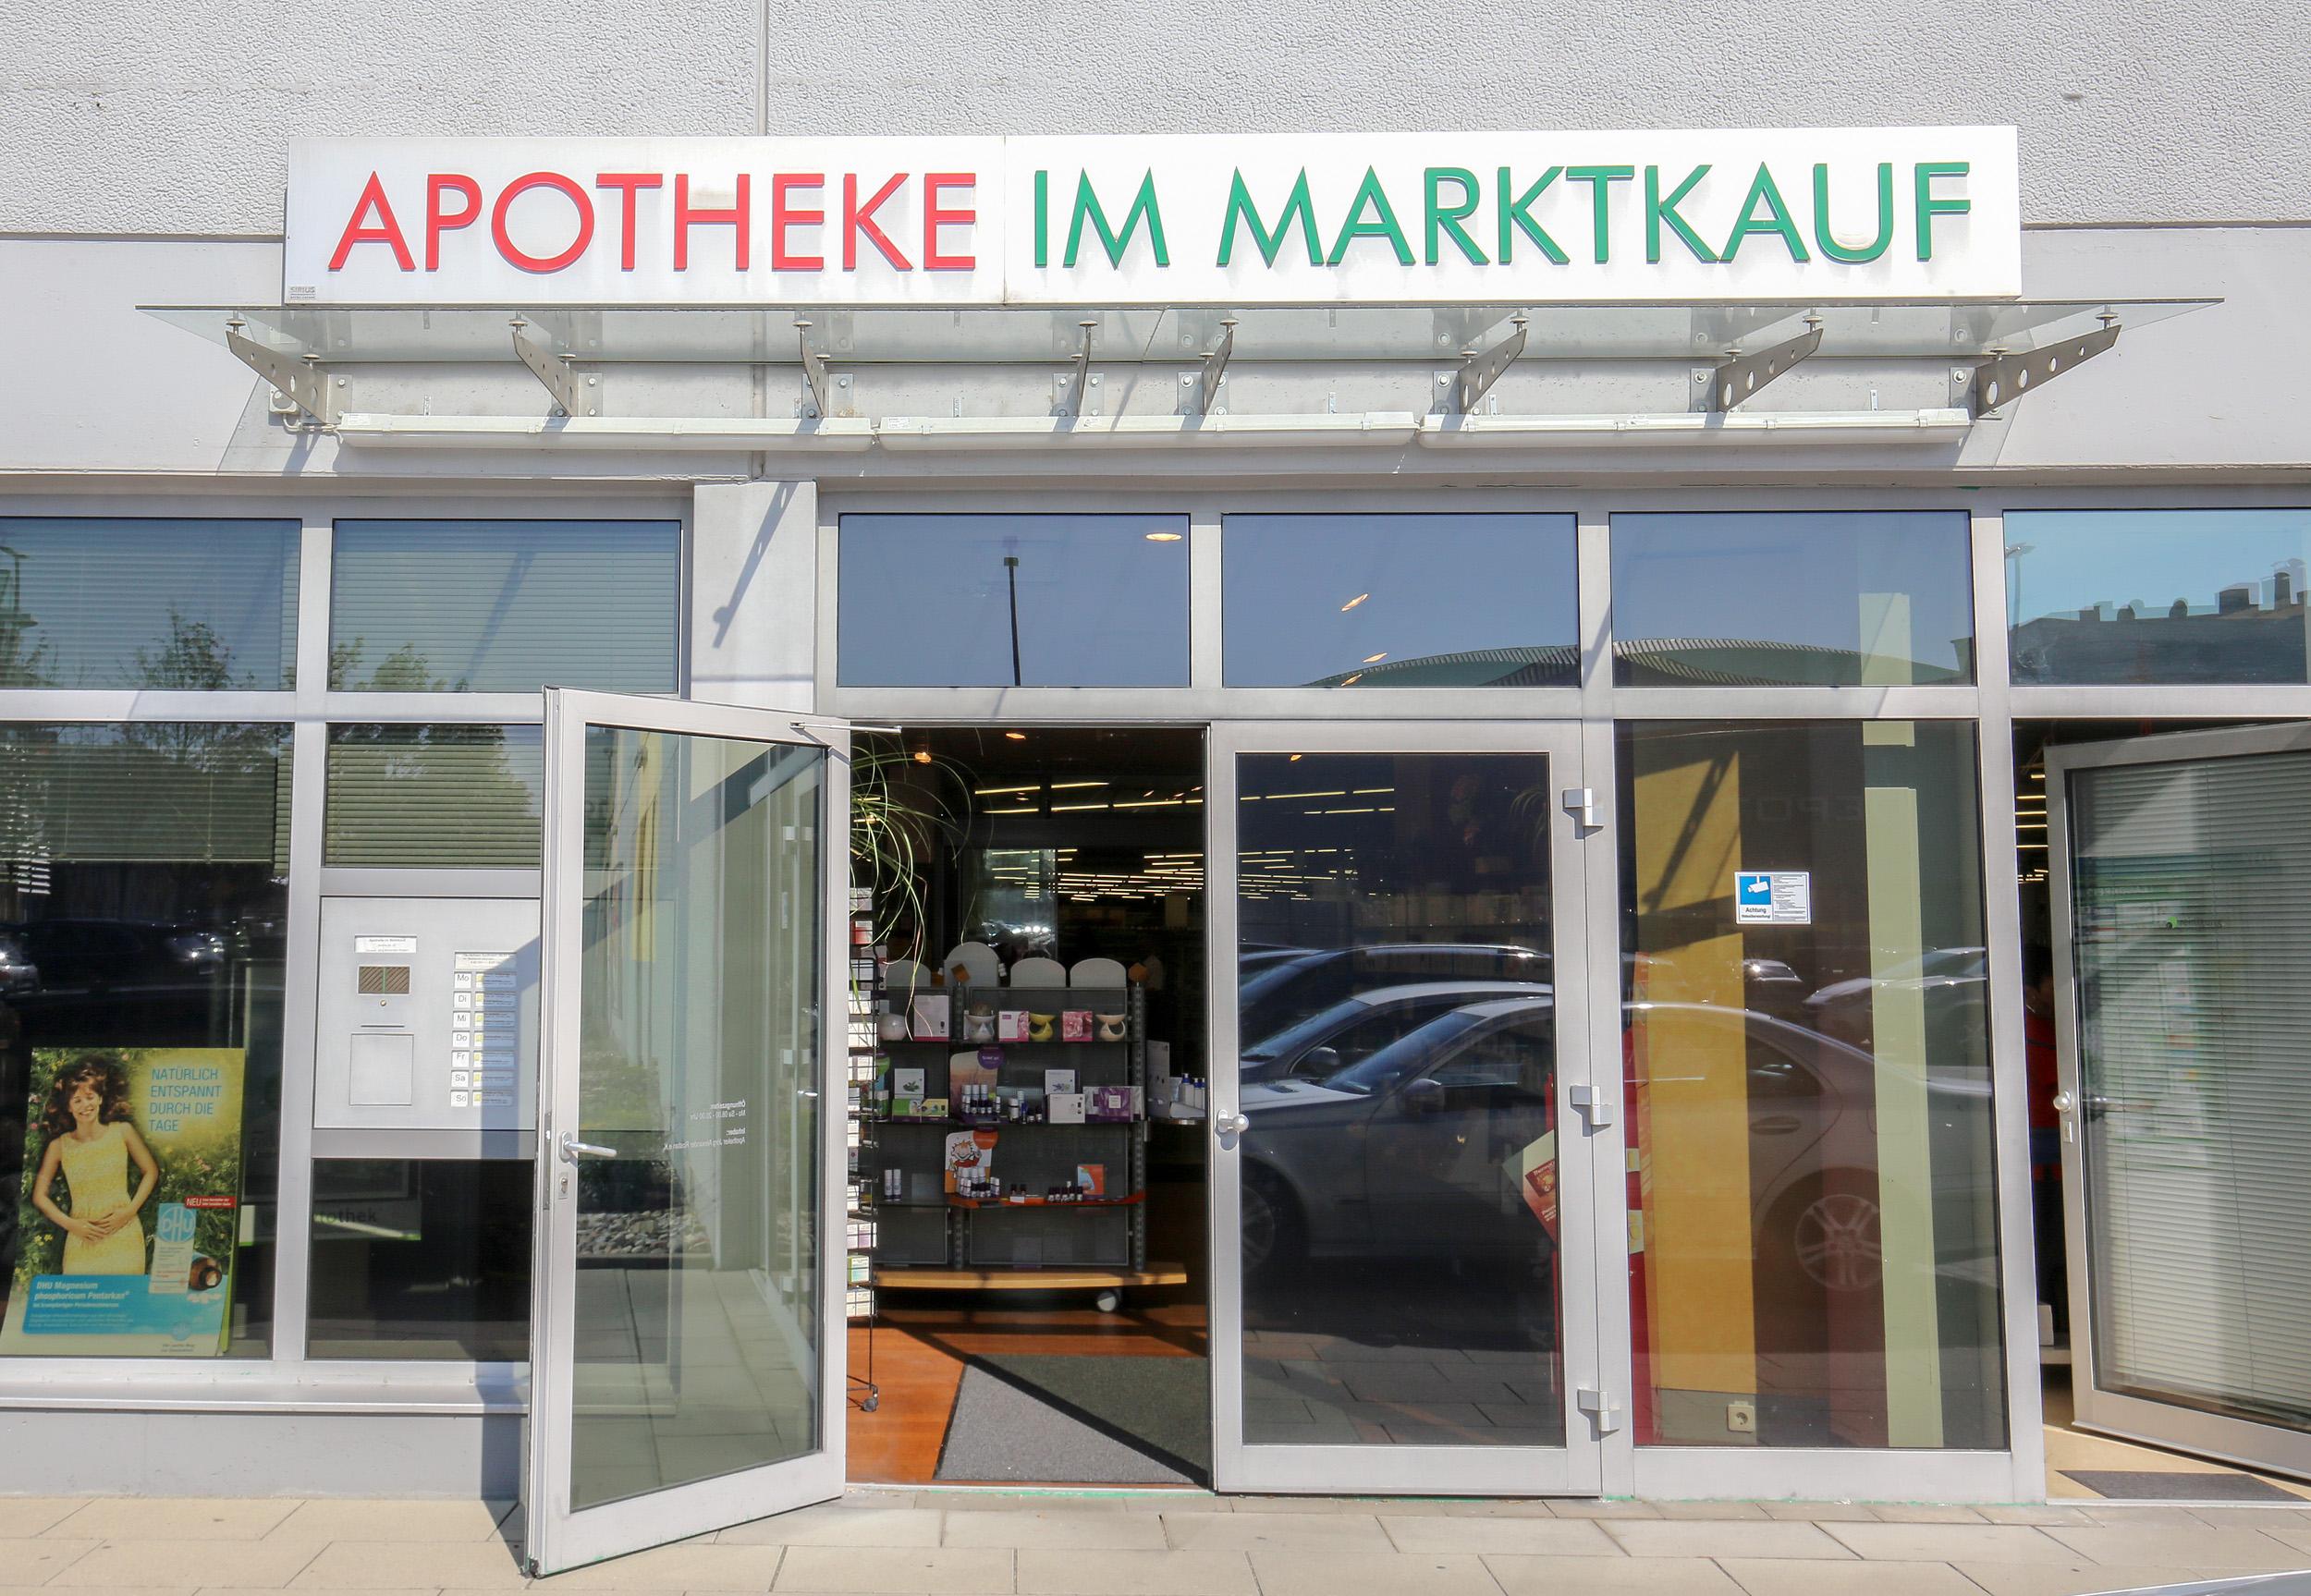 Apotheke im Marktkauf, Jörg A. Rostan e.K.